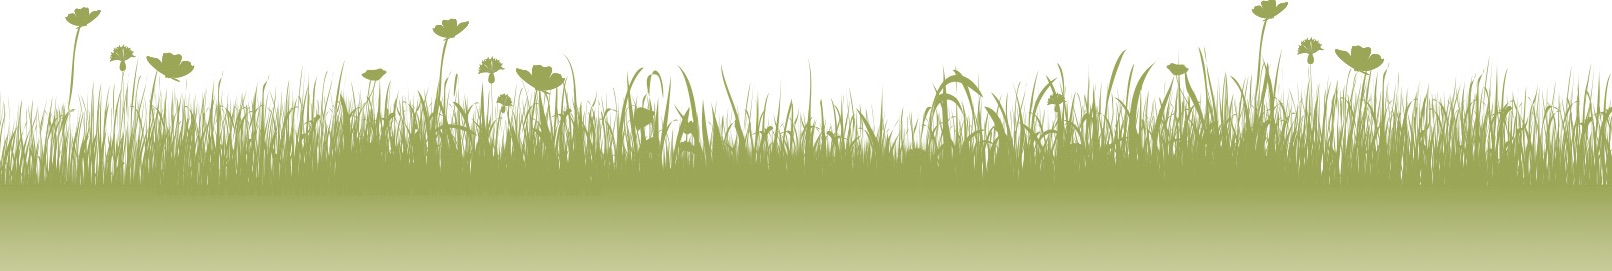 alleen gras